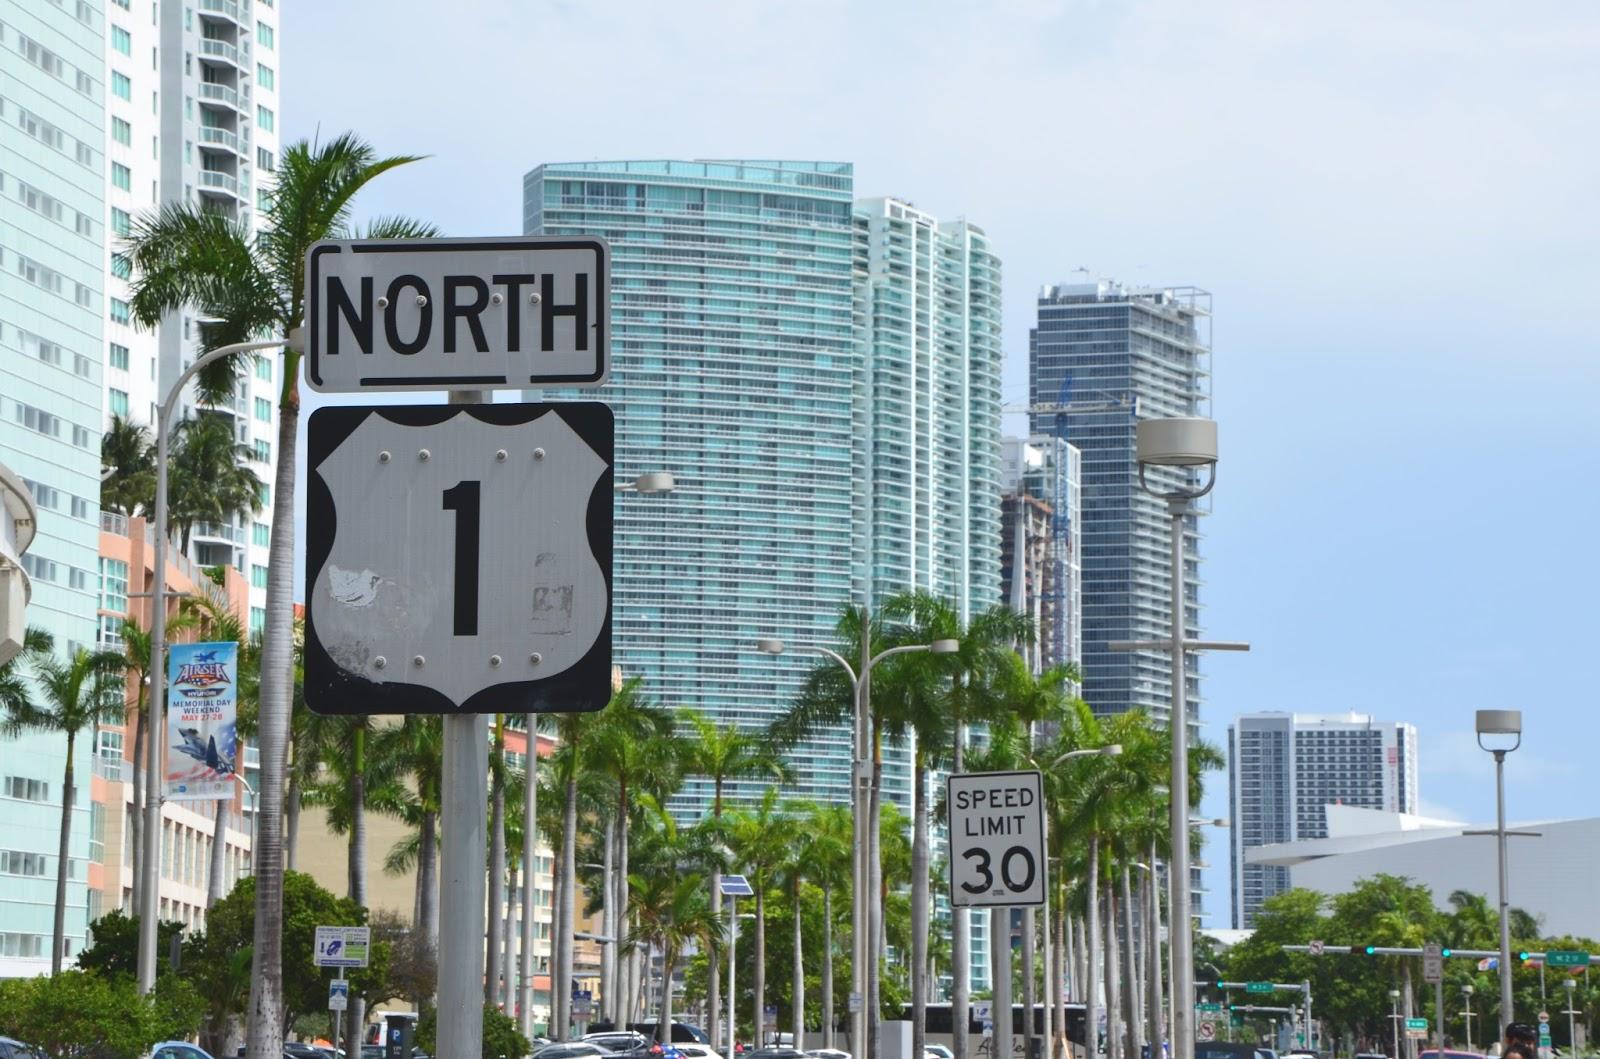 Biscaye boulevard Downtown Miami floride USA juin 2017